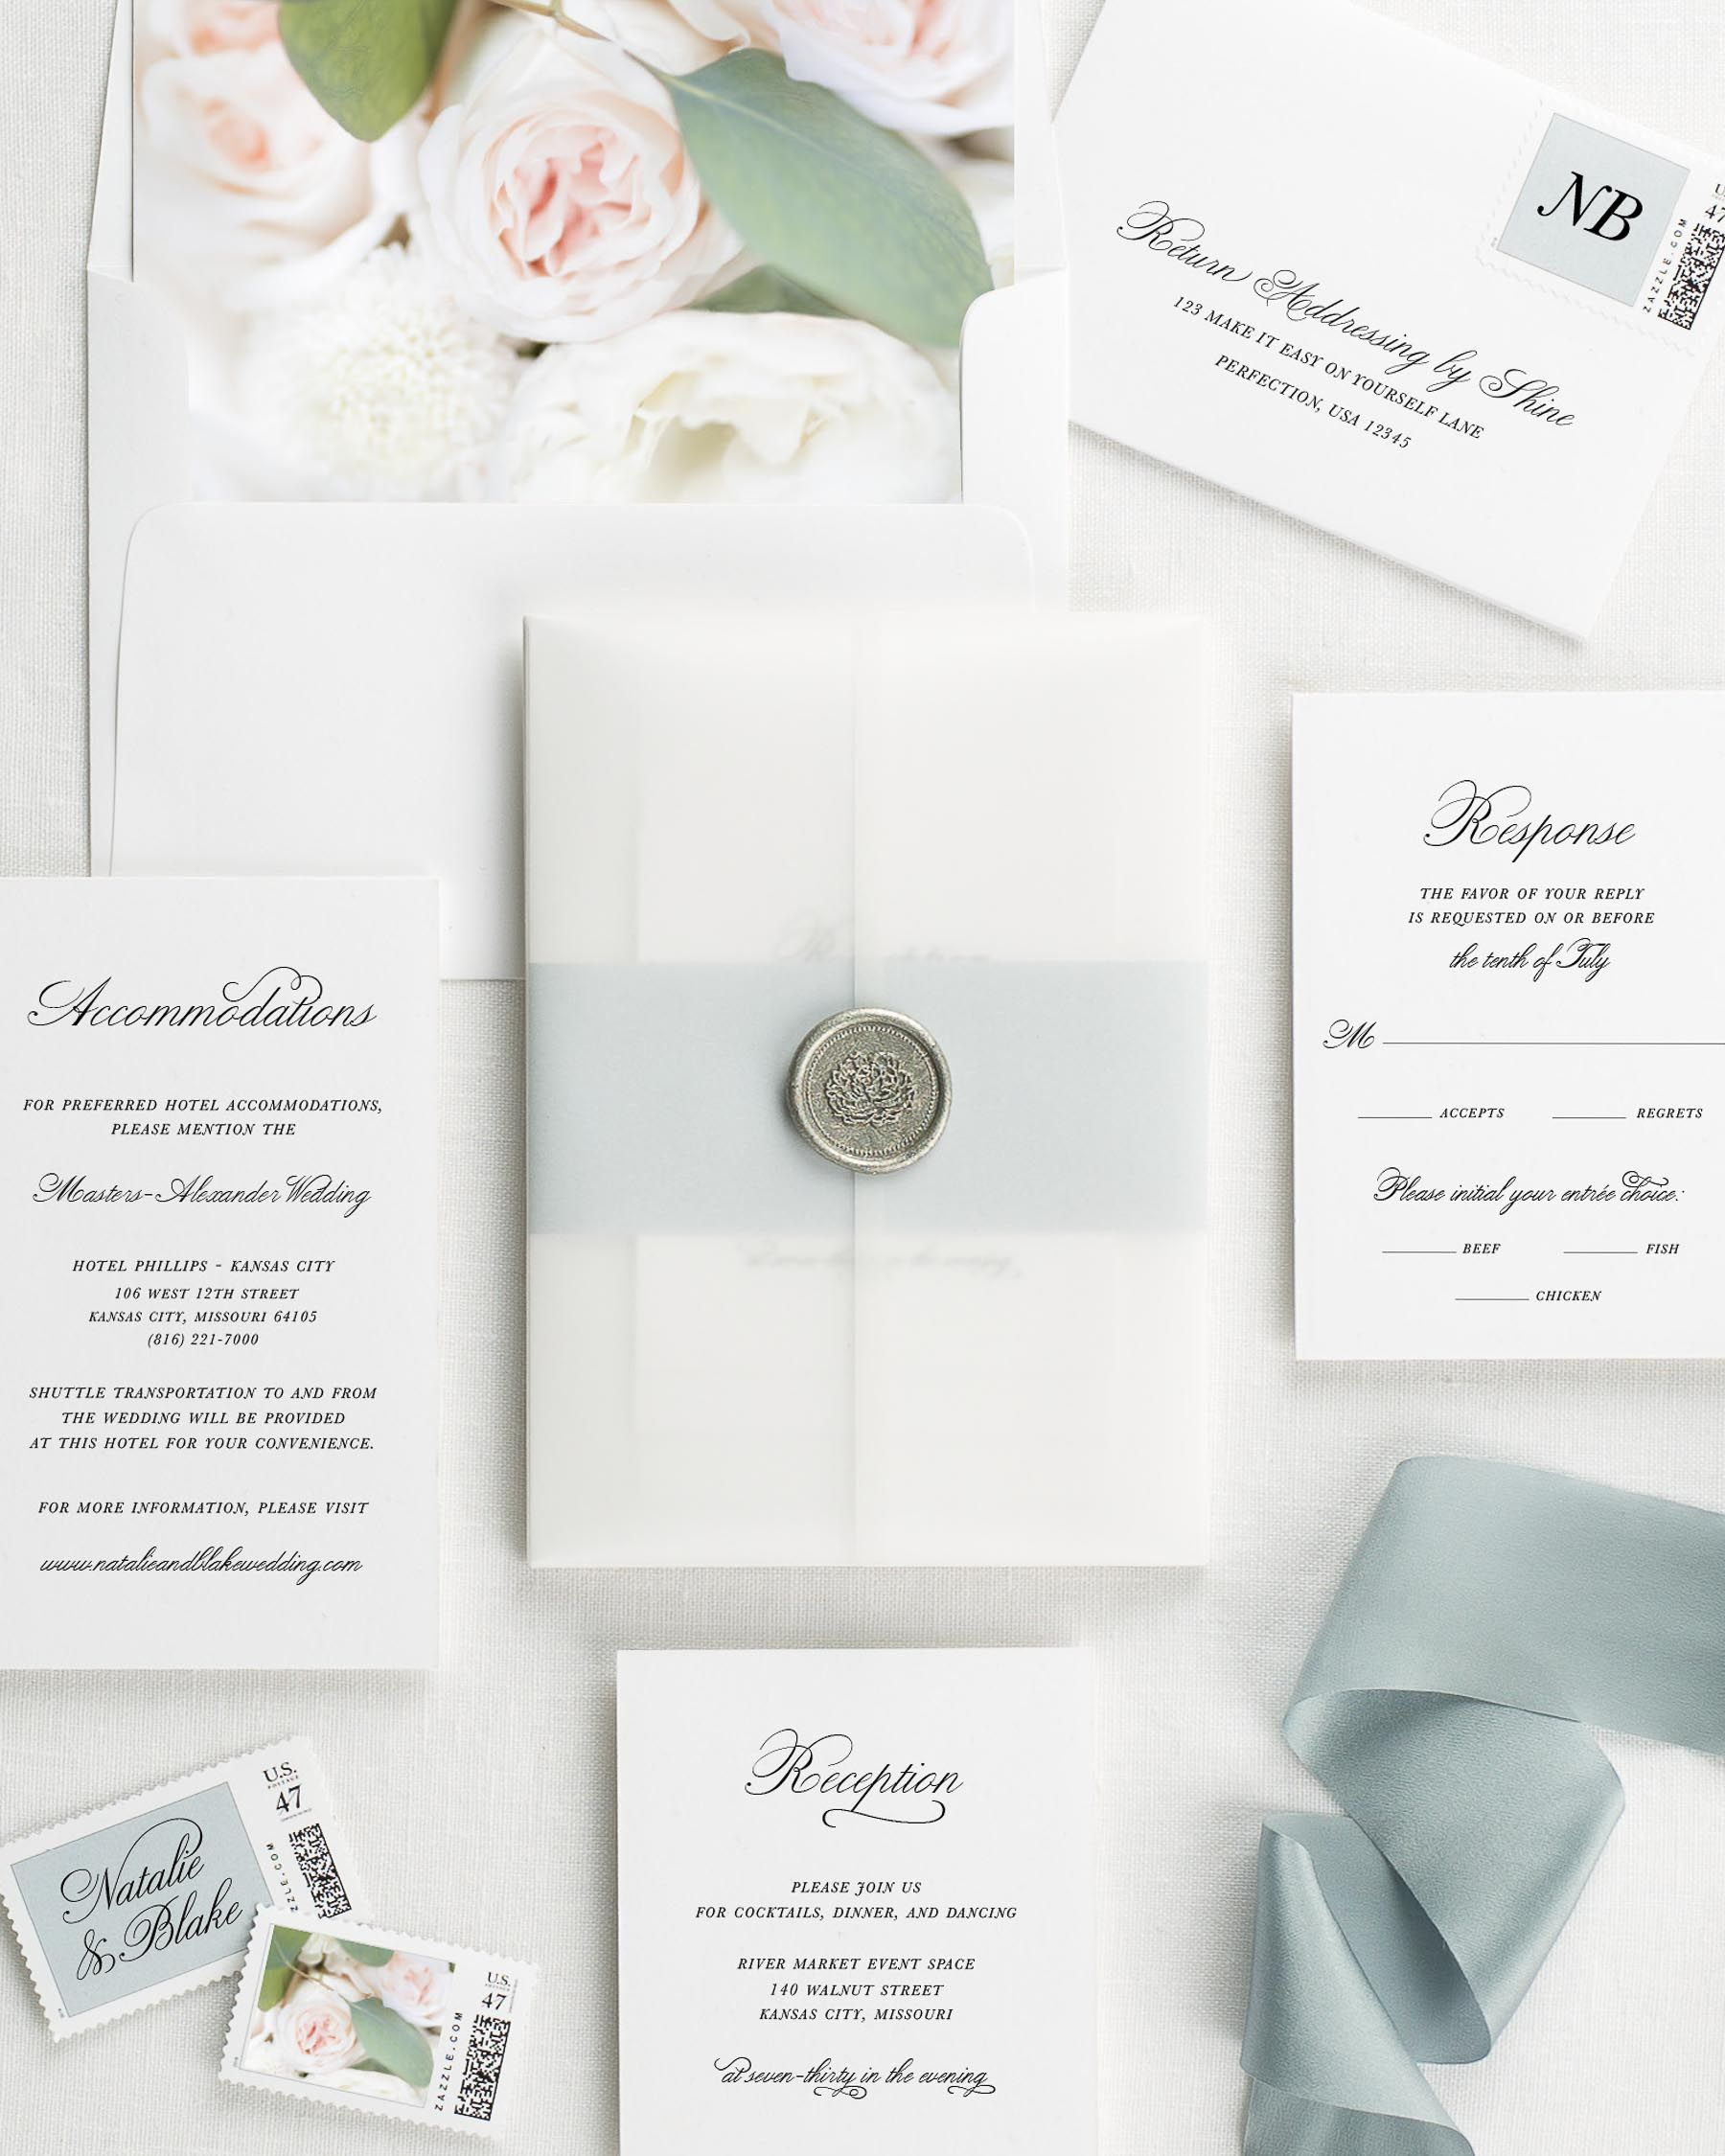 Classic Script Floral Wedding Invitations   Floral wedding, Weddings ...